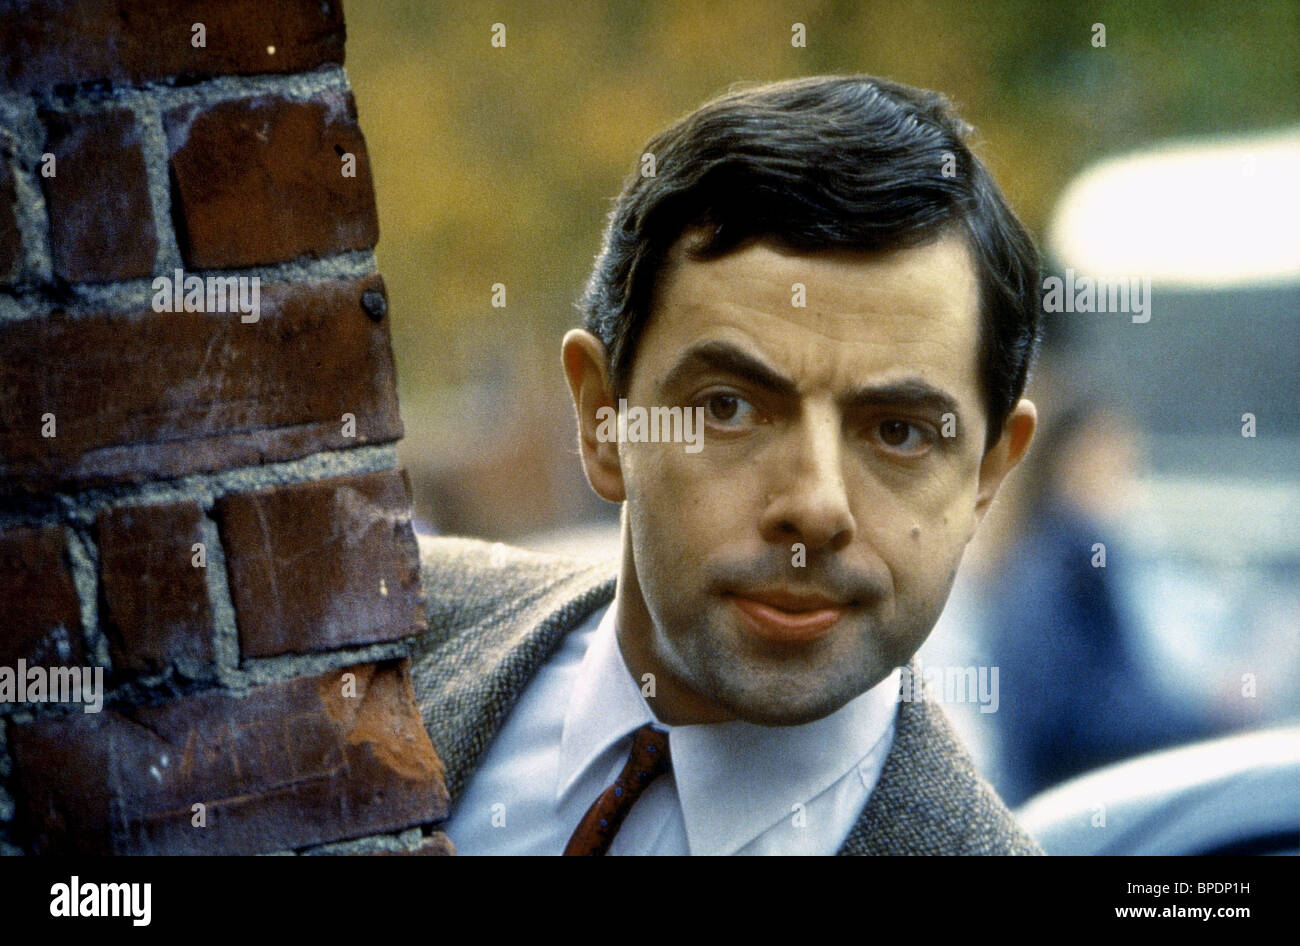 Mr Bean Frohe Weihnachten.Rowan Atkinson Actor Mr Bean Stock Photos Rowan Atkinson Actor Mr